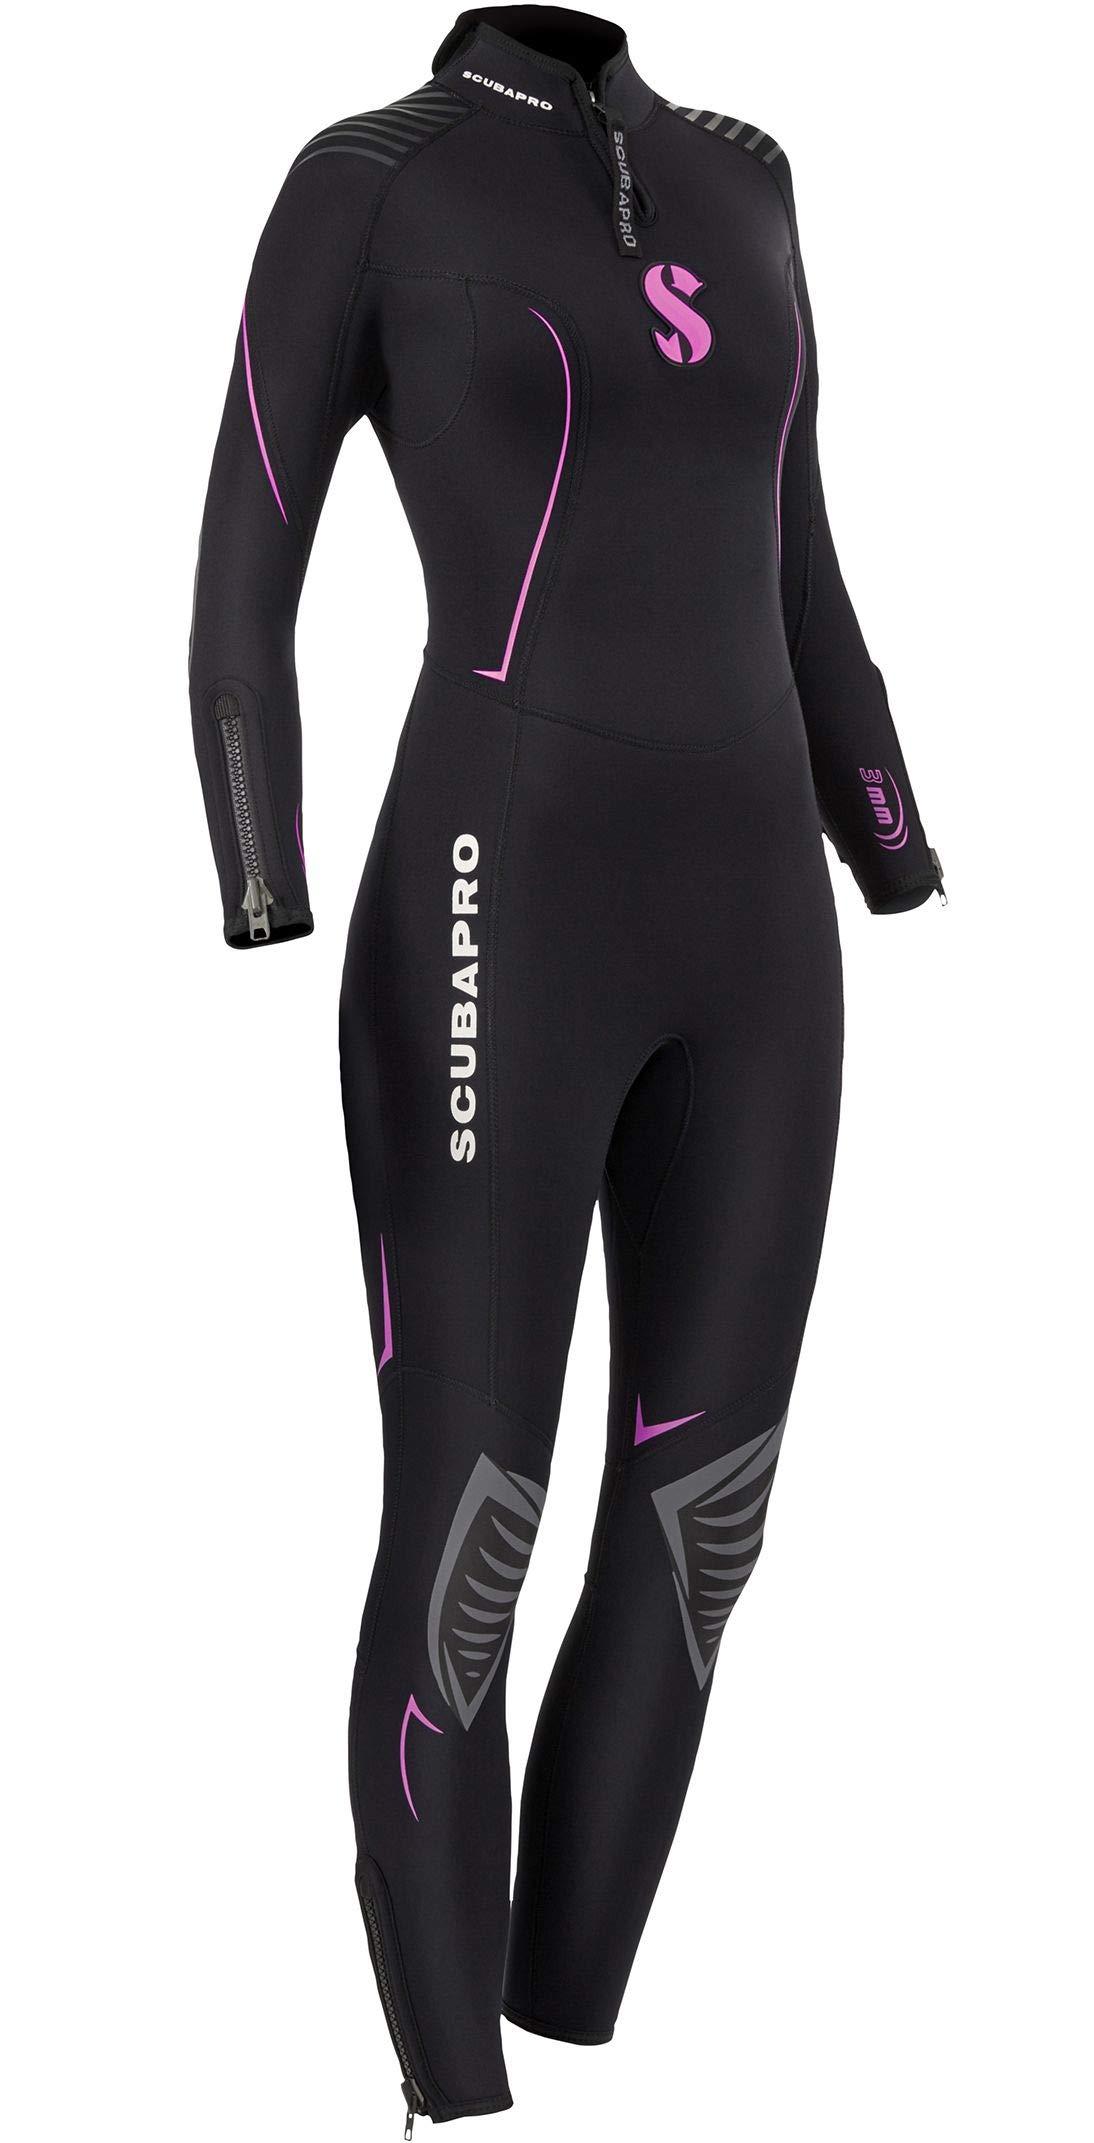 Scubapro Women's Definition Steamer 3mm Wetsuit, Medium - Black/Pink by SCUBAPRO